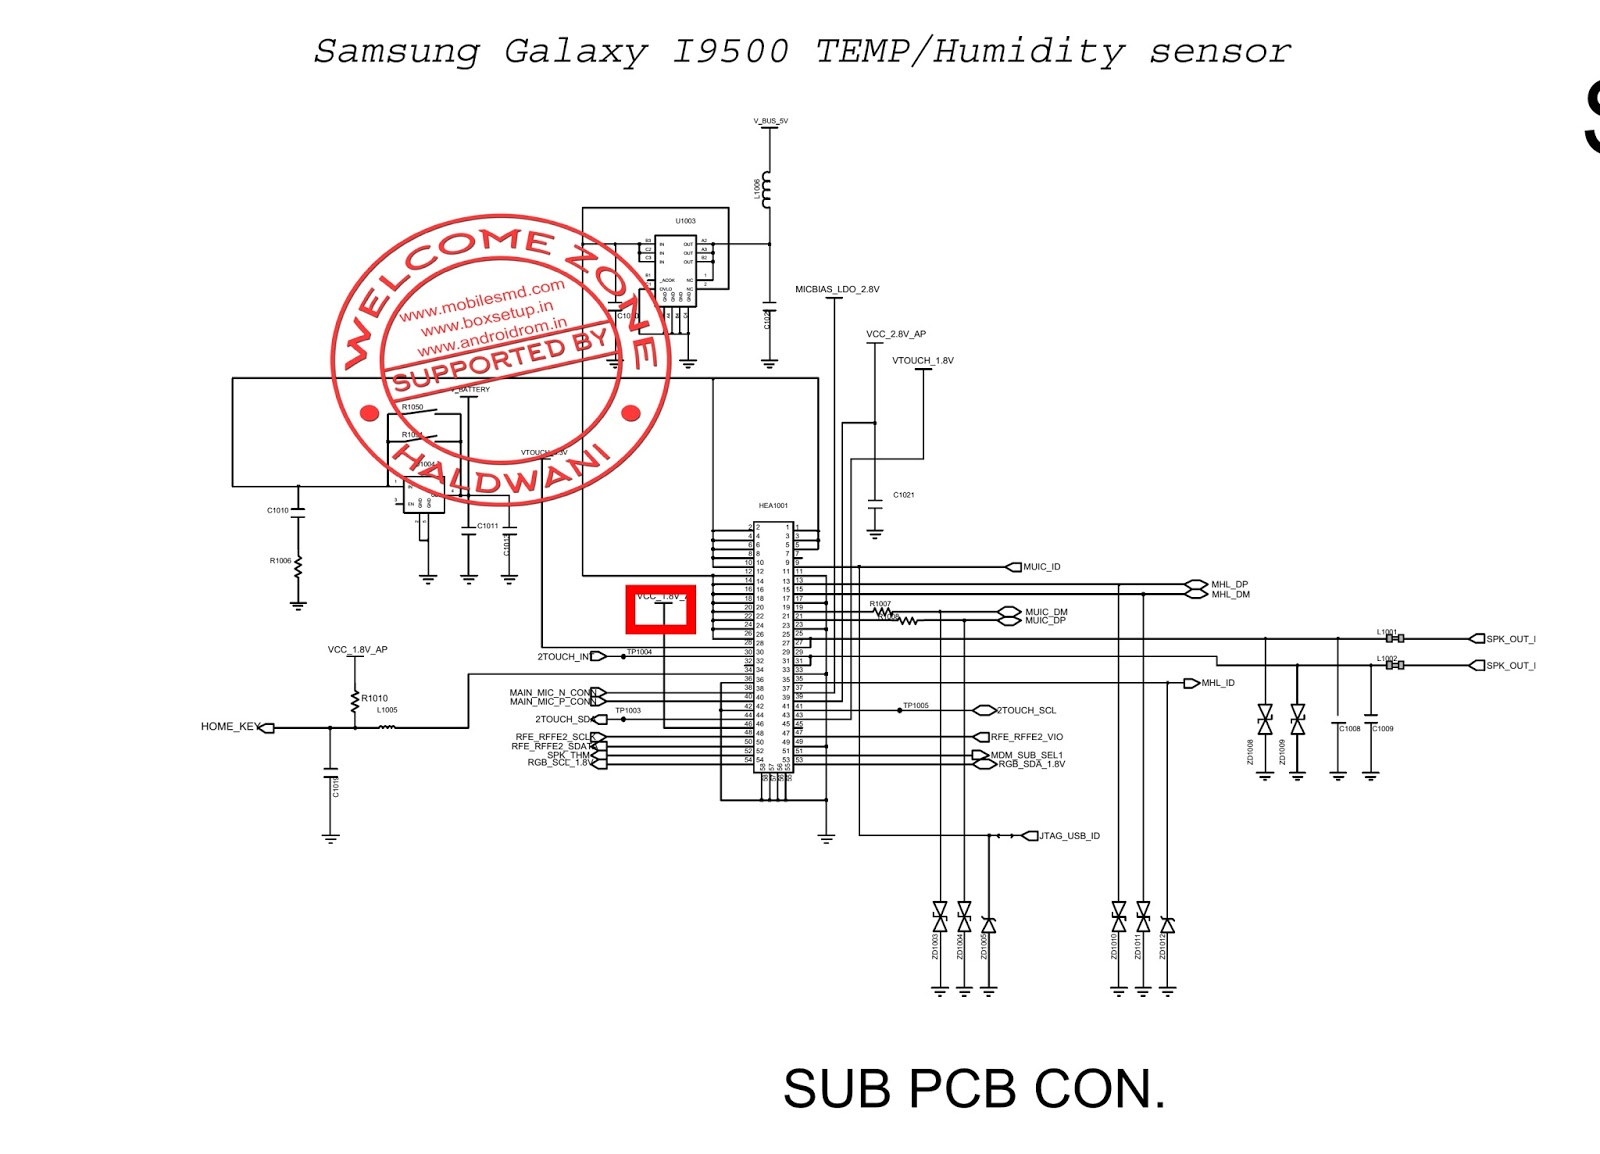 Samsung galaxy S4 I9500 TEMP Humidity sensor Not Working